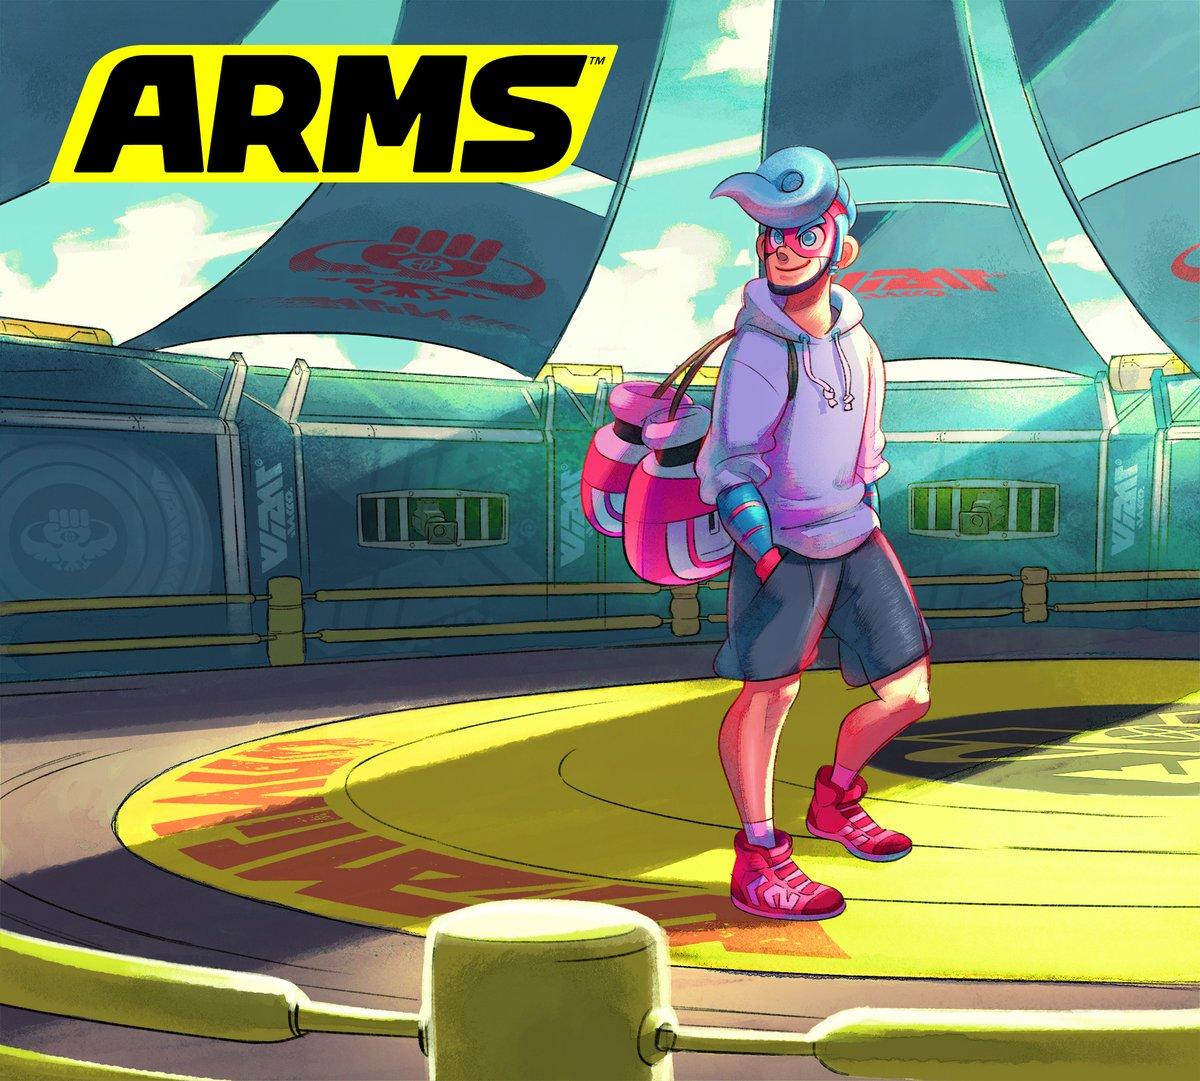 『ARMS』の更新データVer. 3.1.0が9月29日から配信開始!